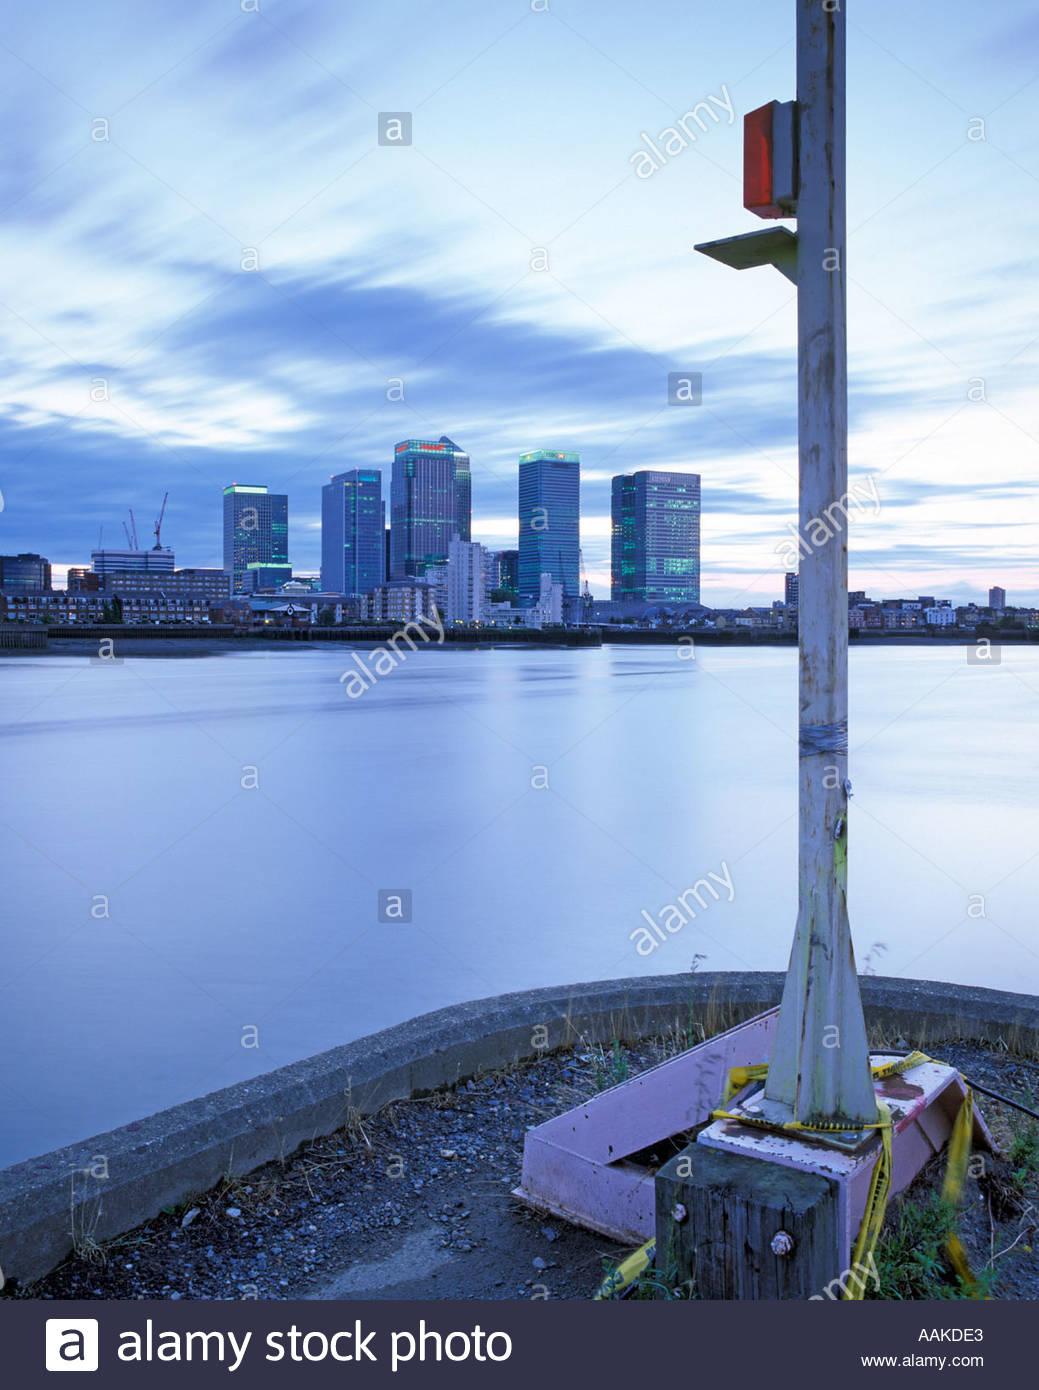 Navigation light River Thames canary wharf London United Kingdom Stock Photo